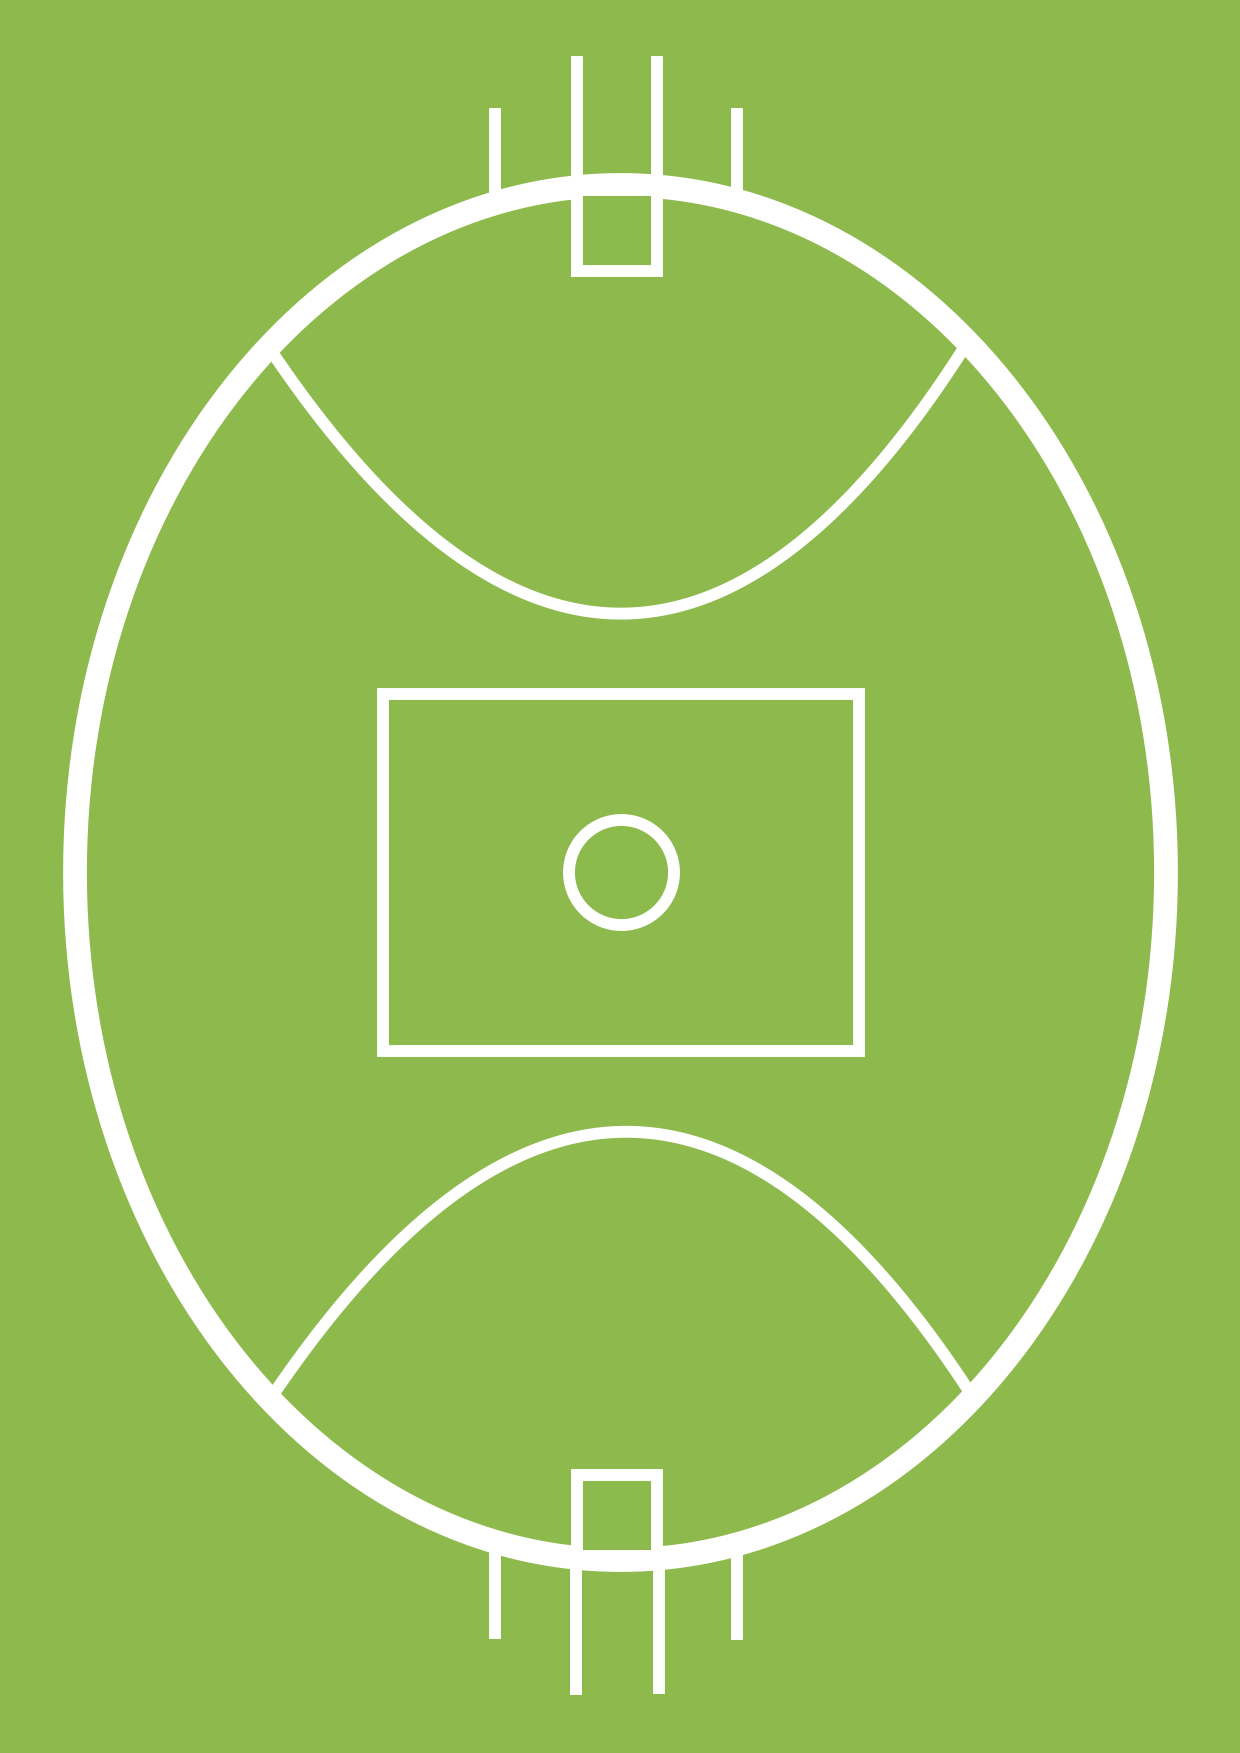 1240x1753 Australian Rules Football Positions